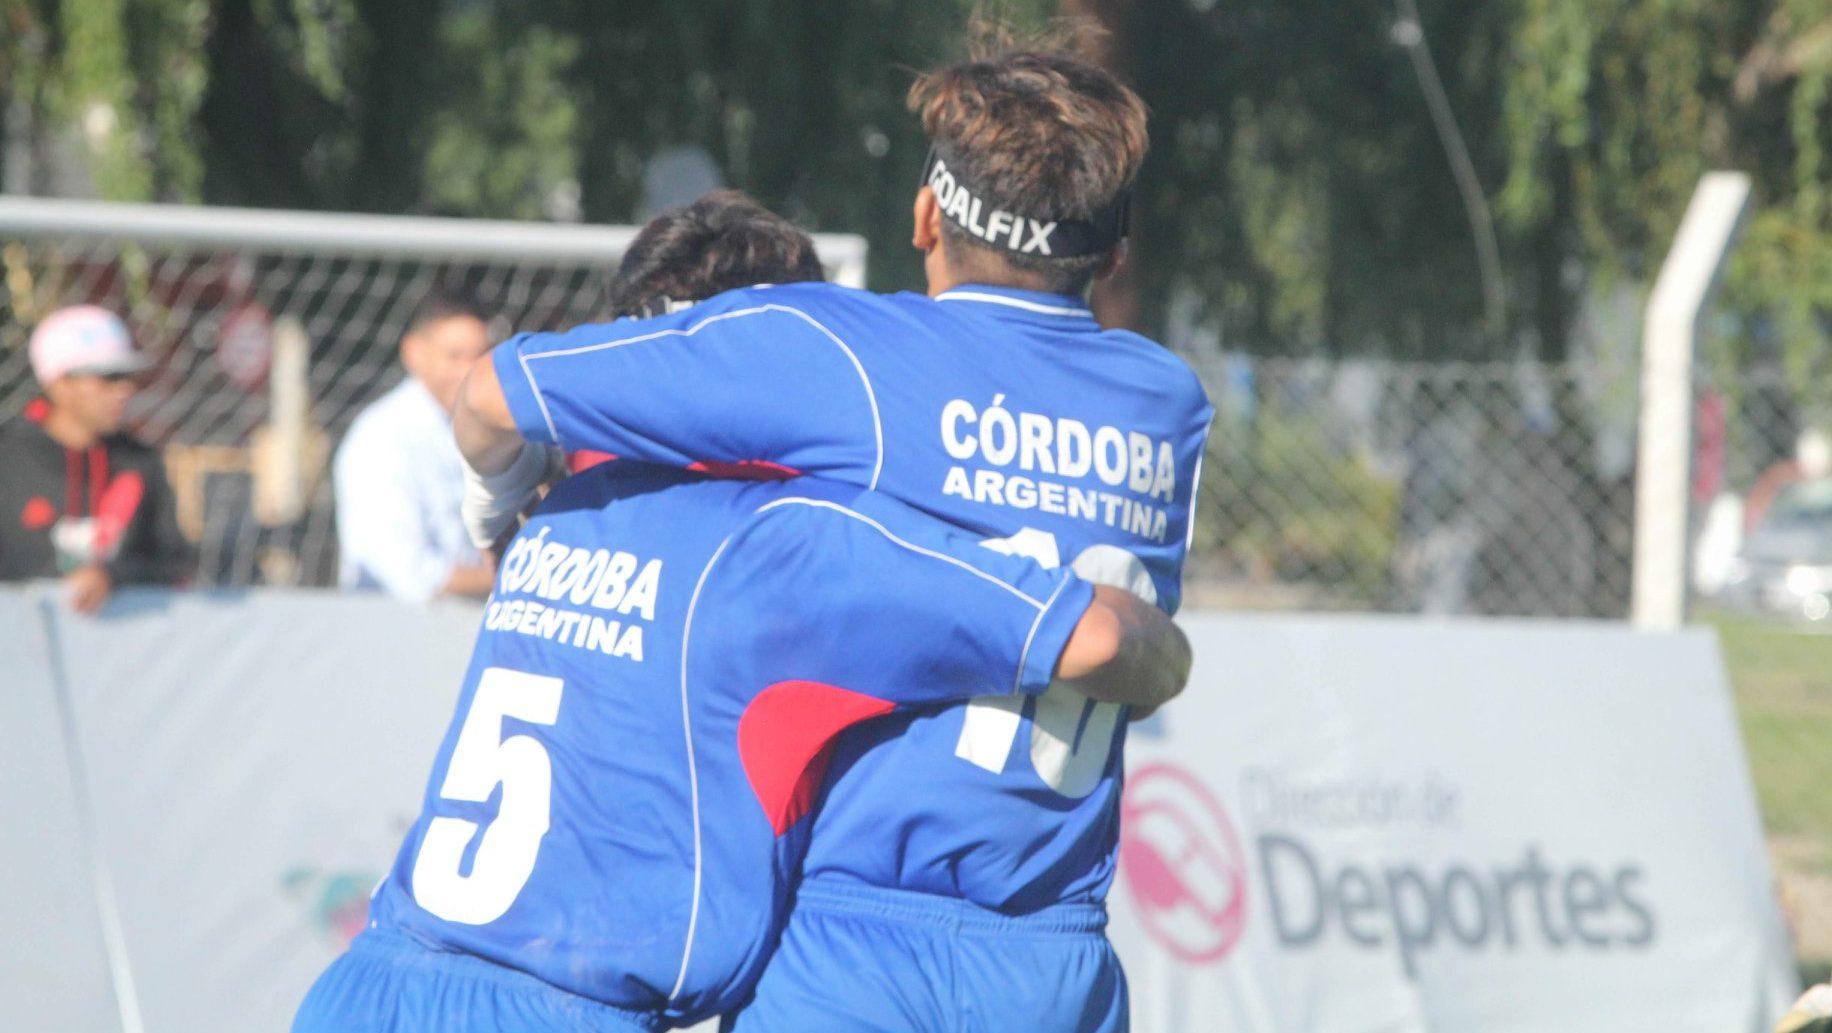 Imagen: dos jugadores se abrazan festejando un gol